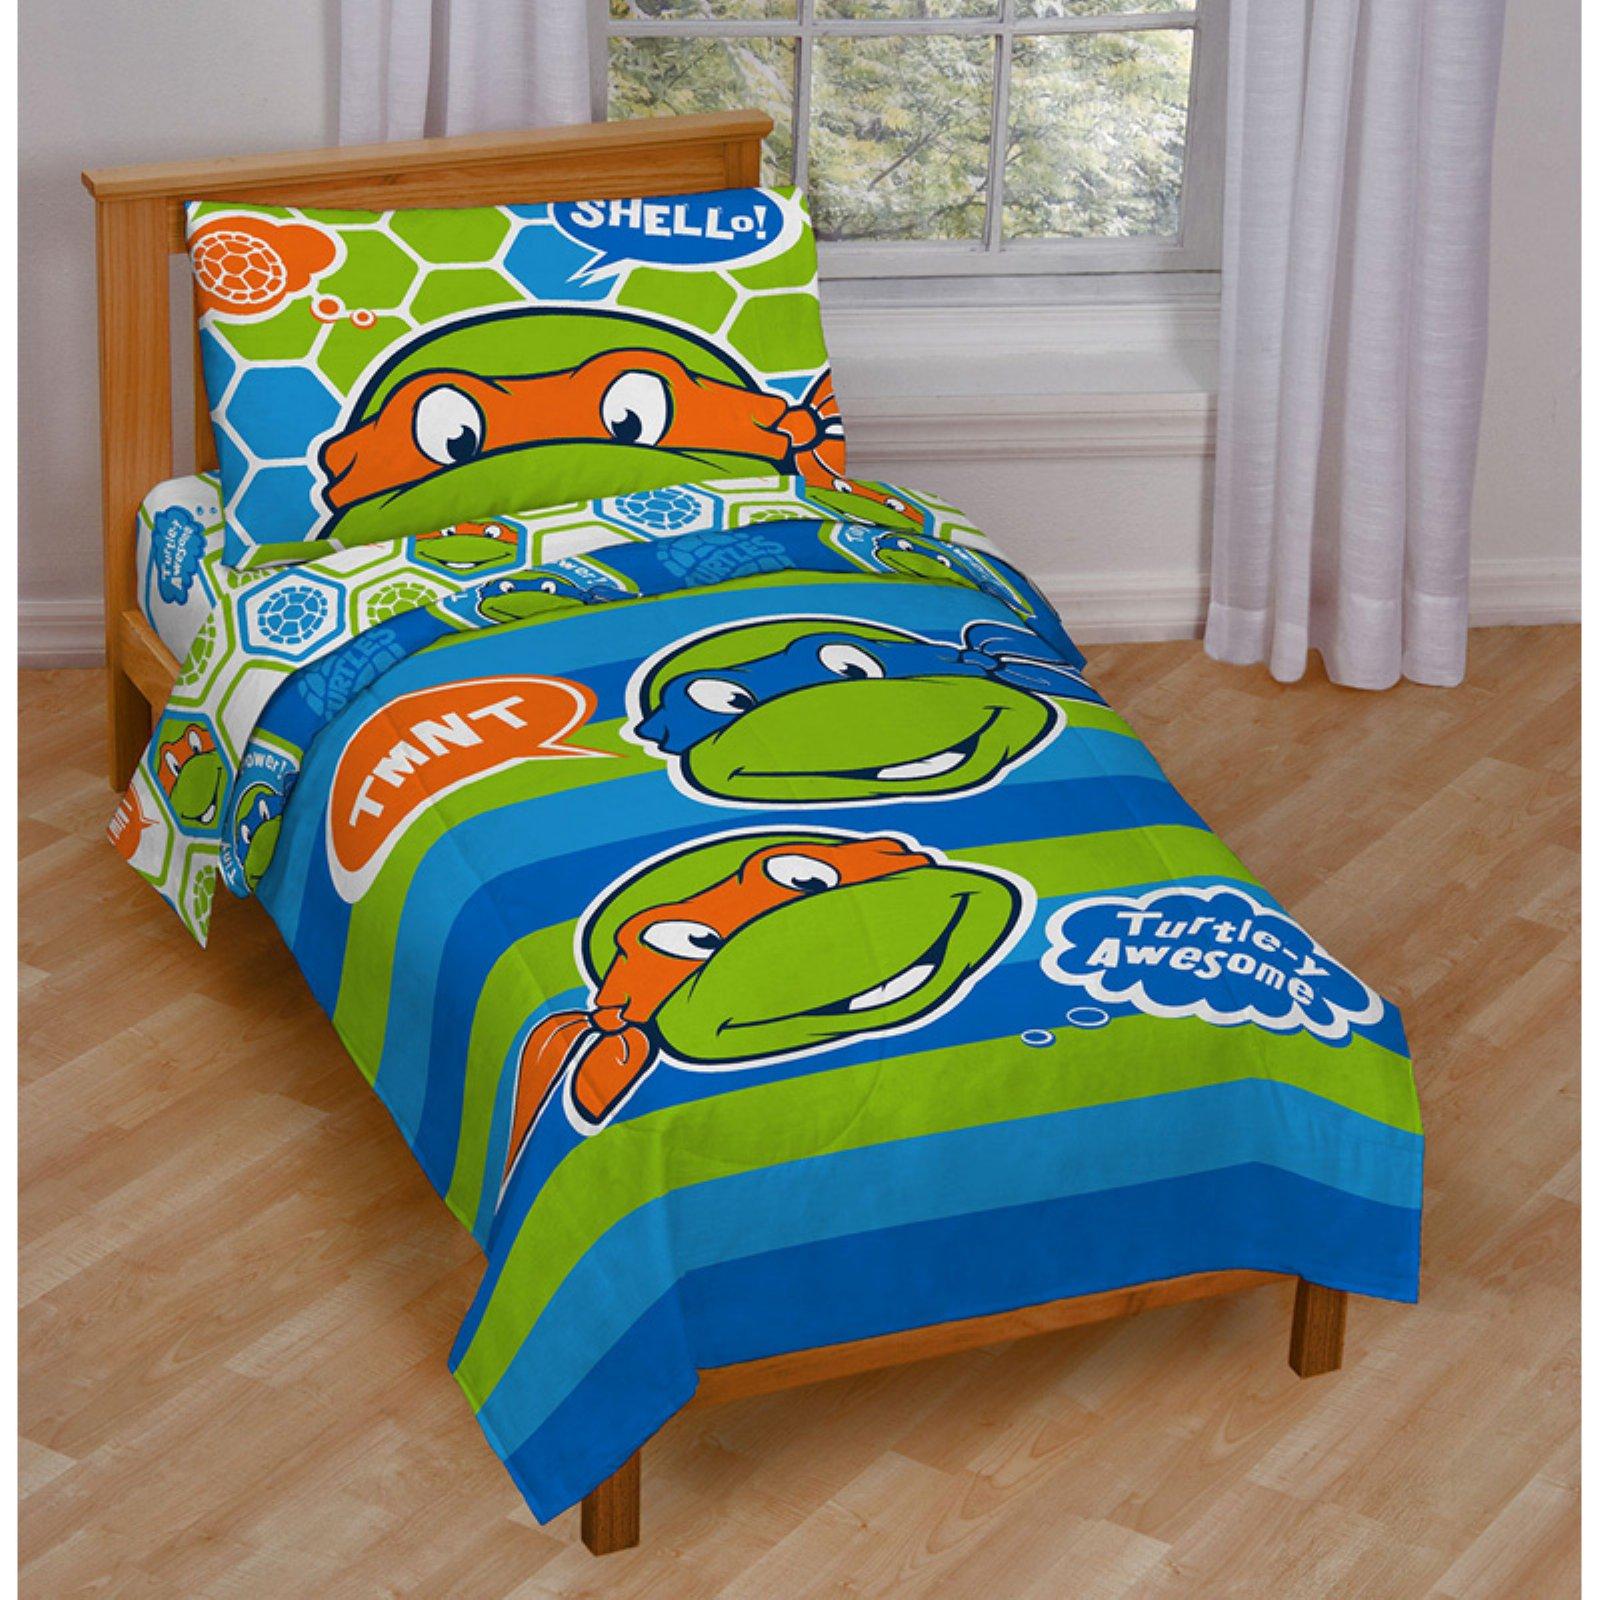 Teenage Mutant Ninja Turtles Turtley Awesome Toddler Bed Set By Nickelodeon Toddler Bed Set Teenage Mutant Ninja Turtles Bedroom Ninja Turtle Bedroom